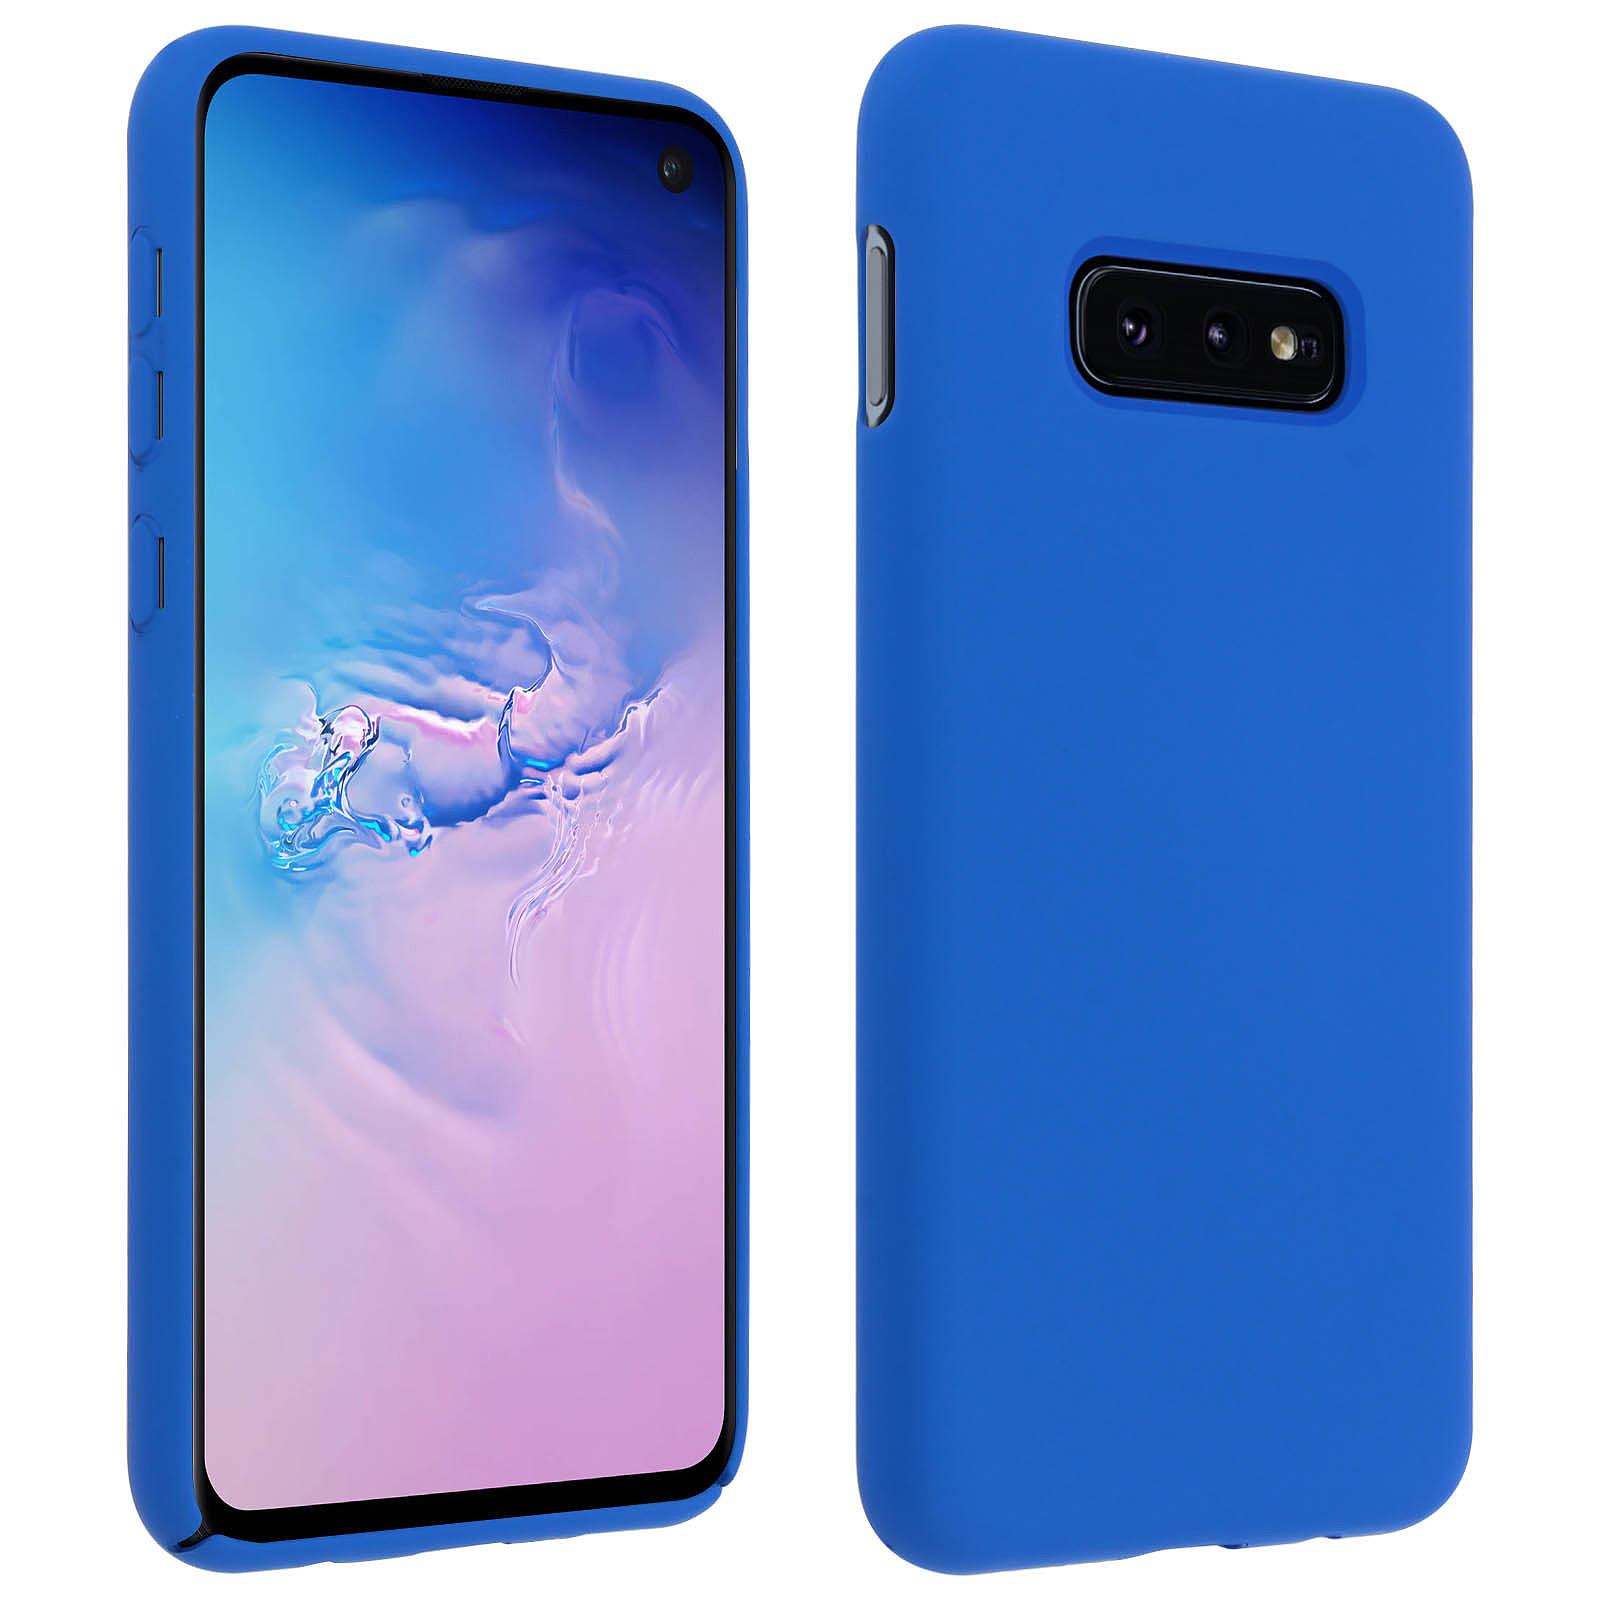 Avizar Coque Bleu Nuit pour Samsung Galaxy S10e